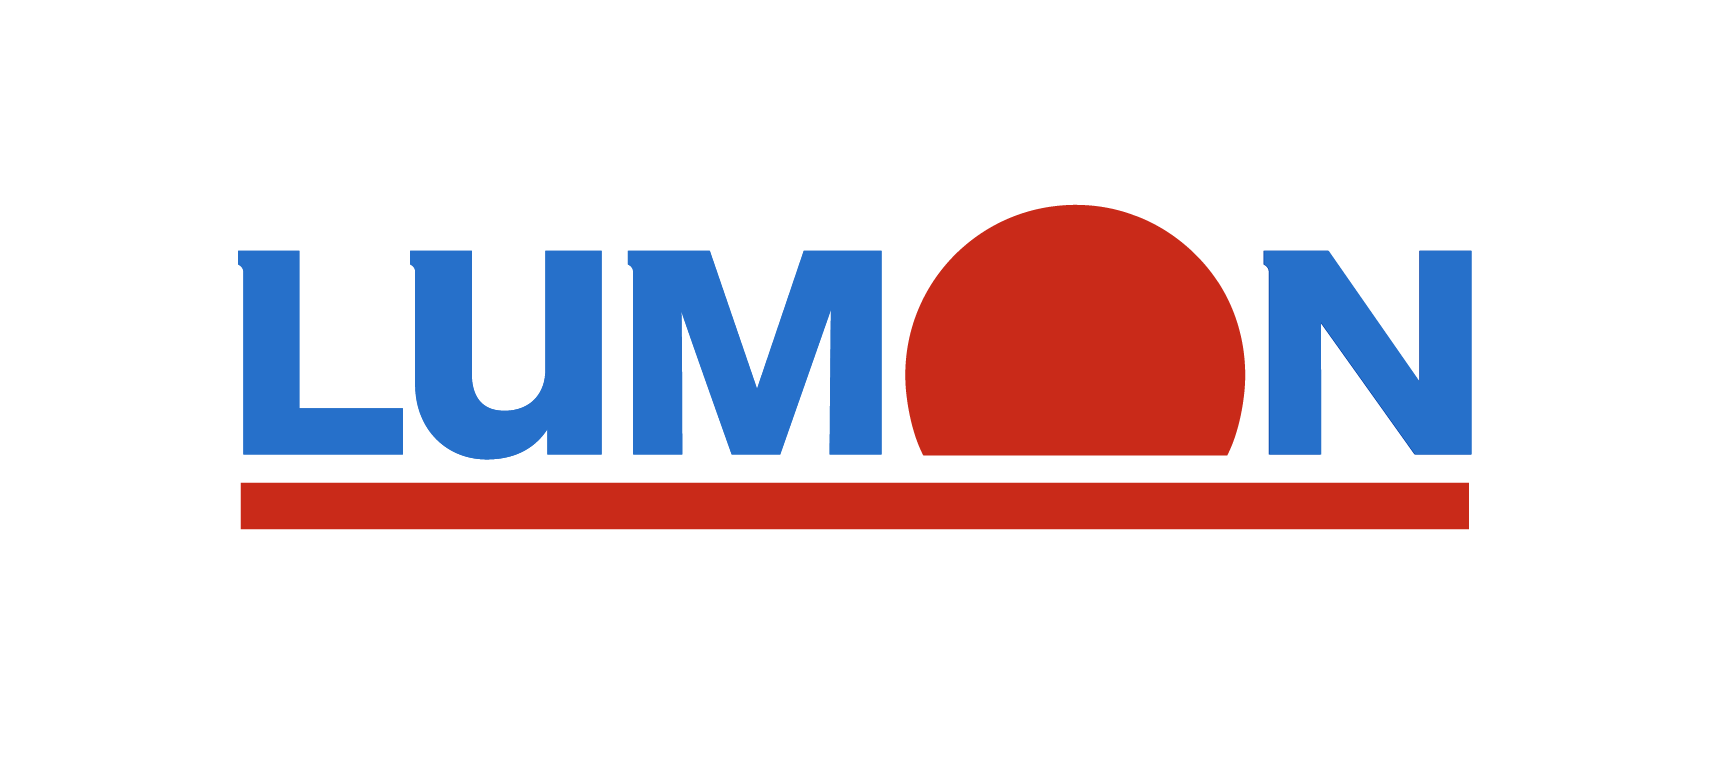 Svenska Lumon AB